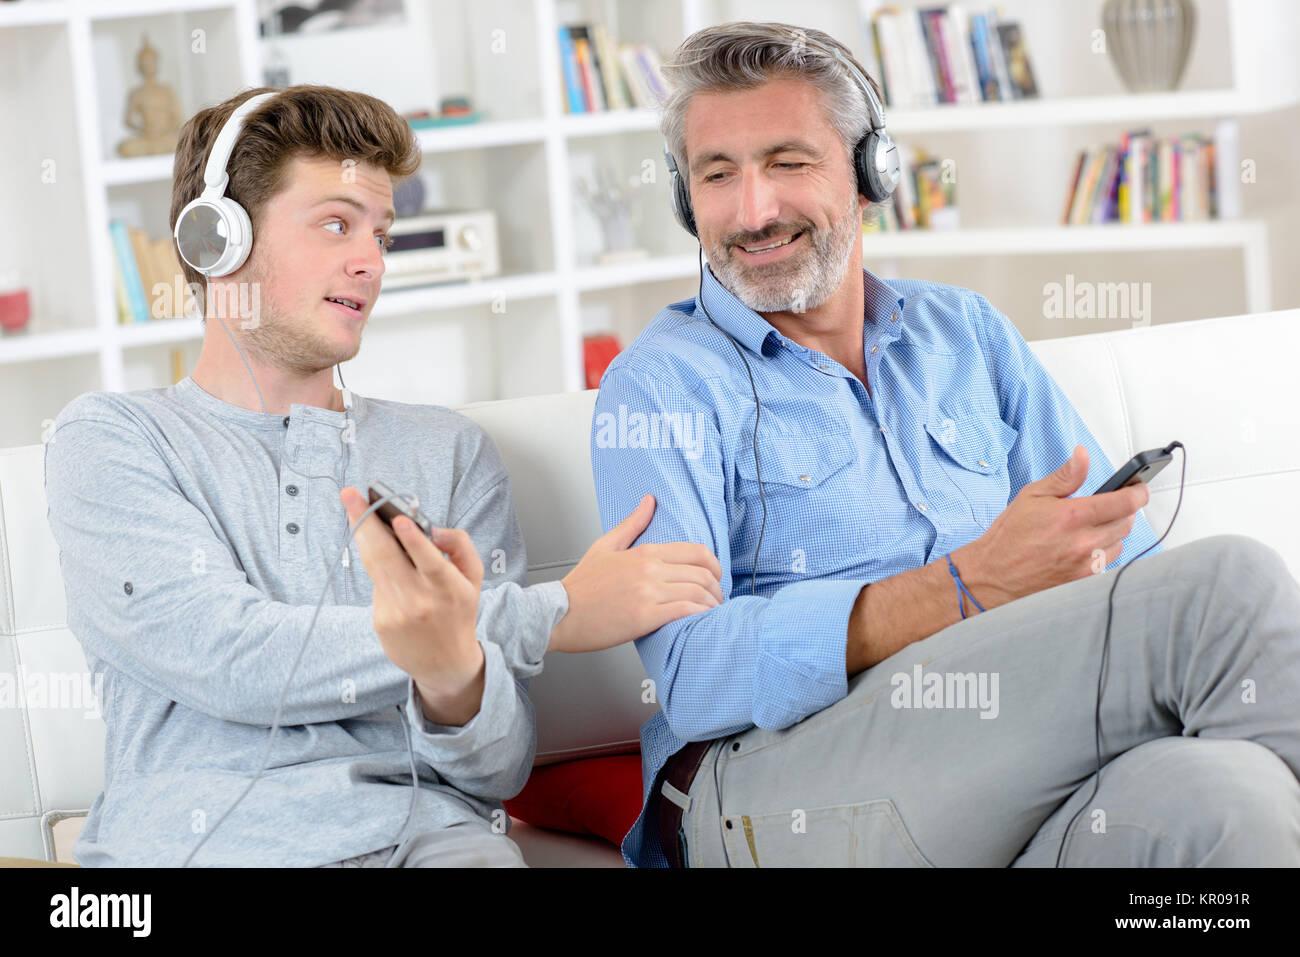 bonding moments - Stock Image